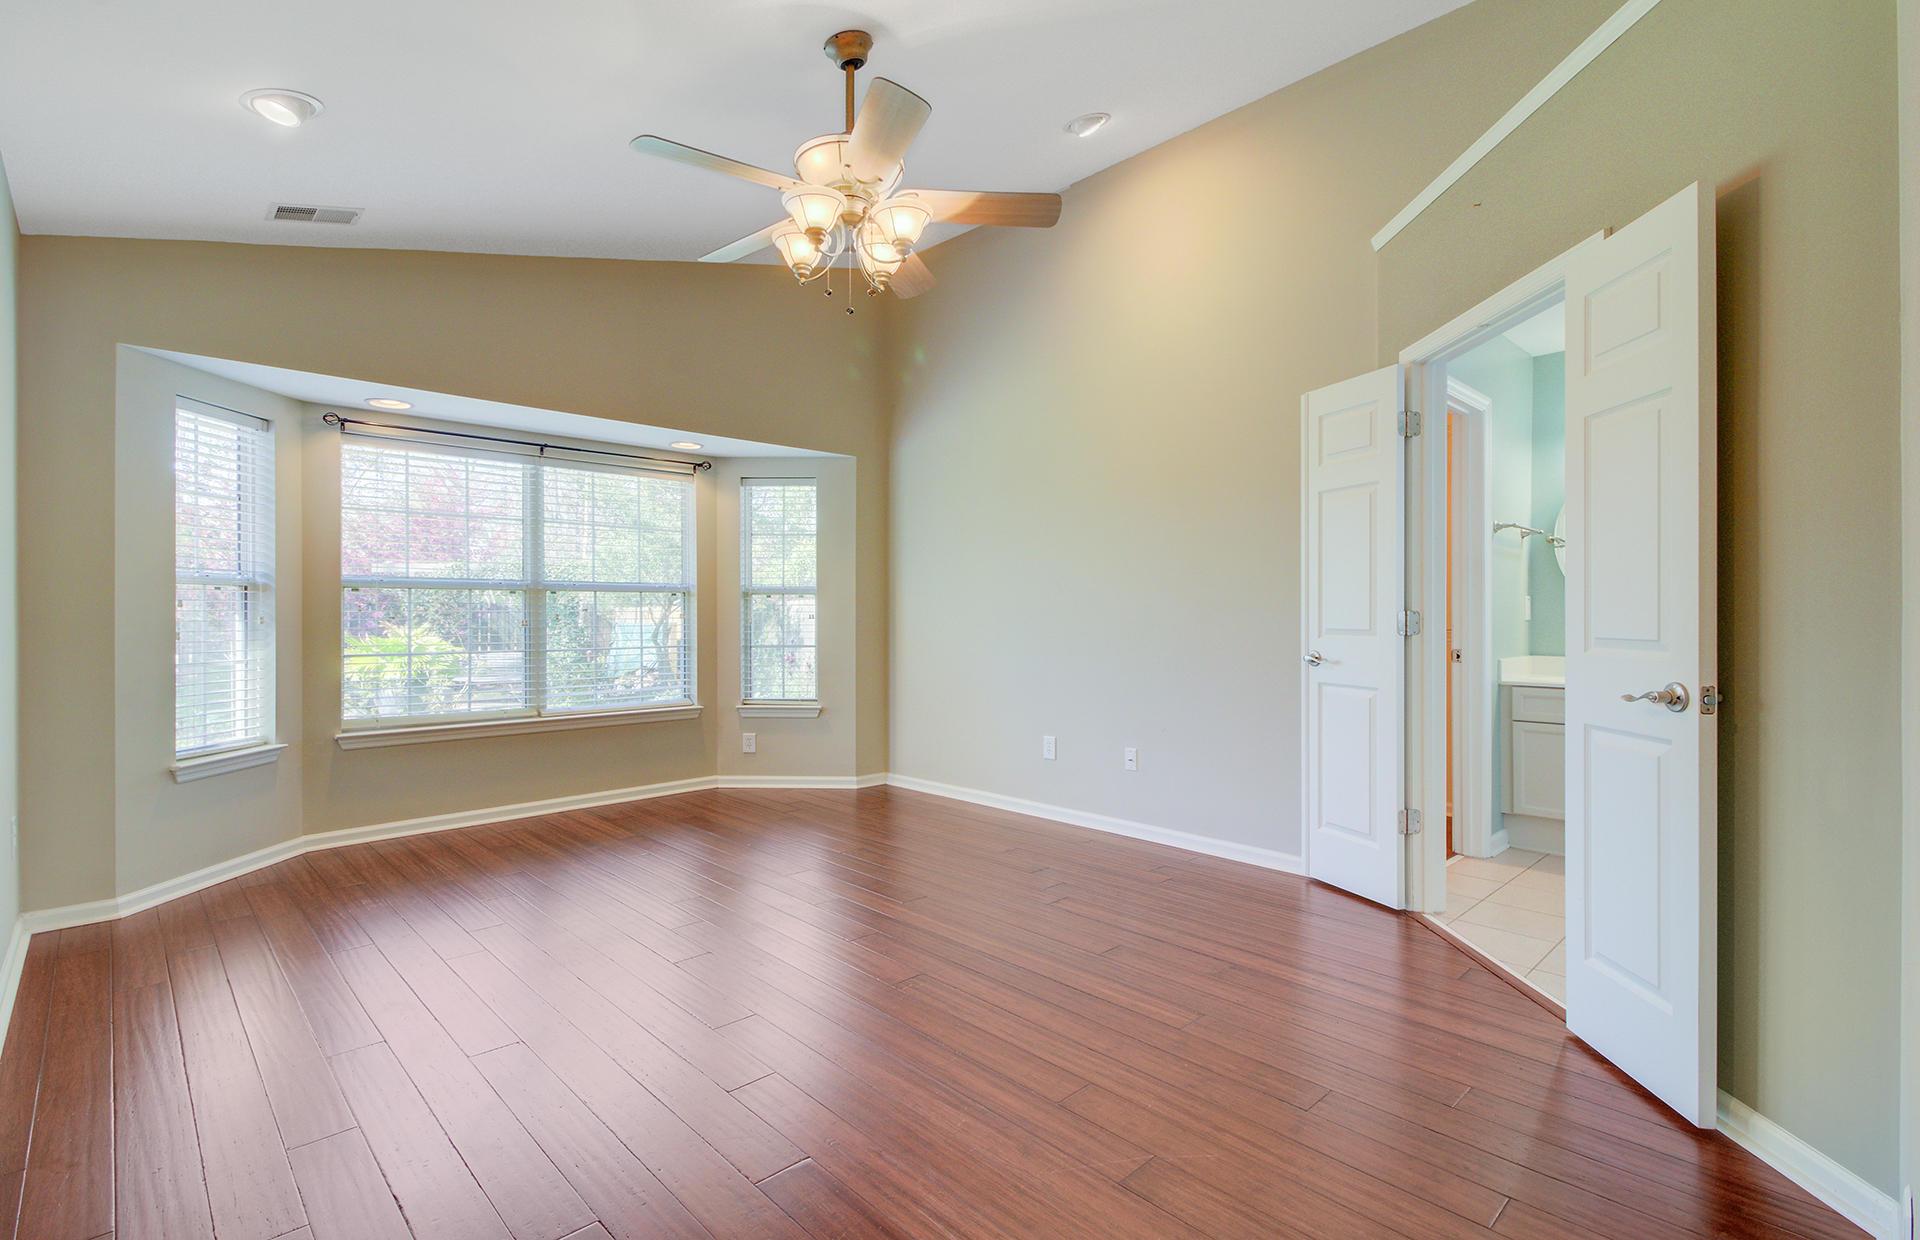 Grand Oaks Plantation Homes For Sale - 789 Bent Hickory, Charleston, SC - 16